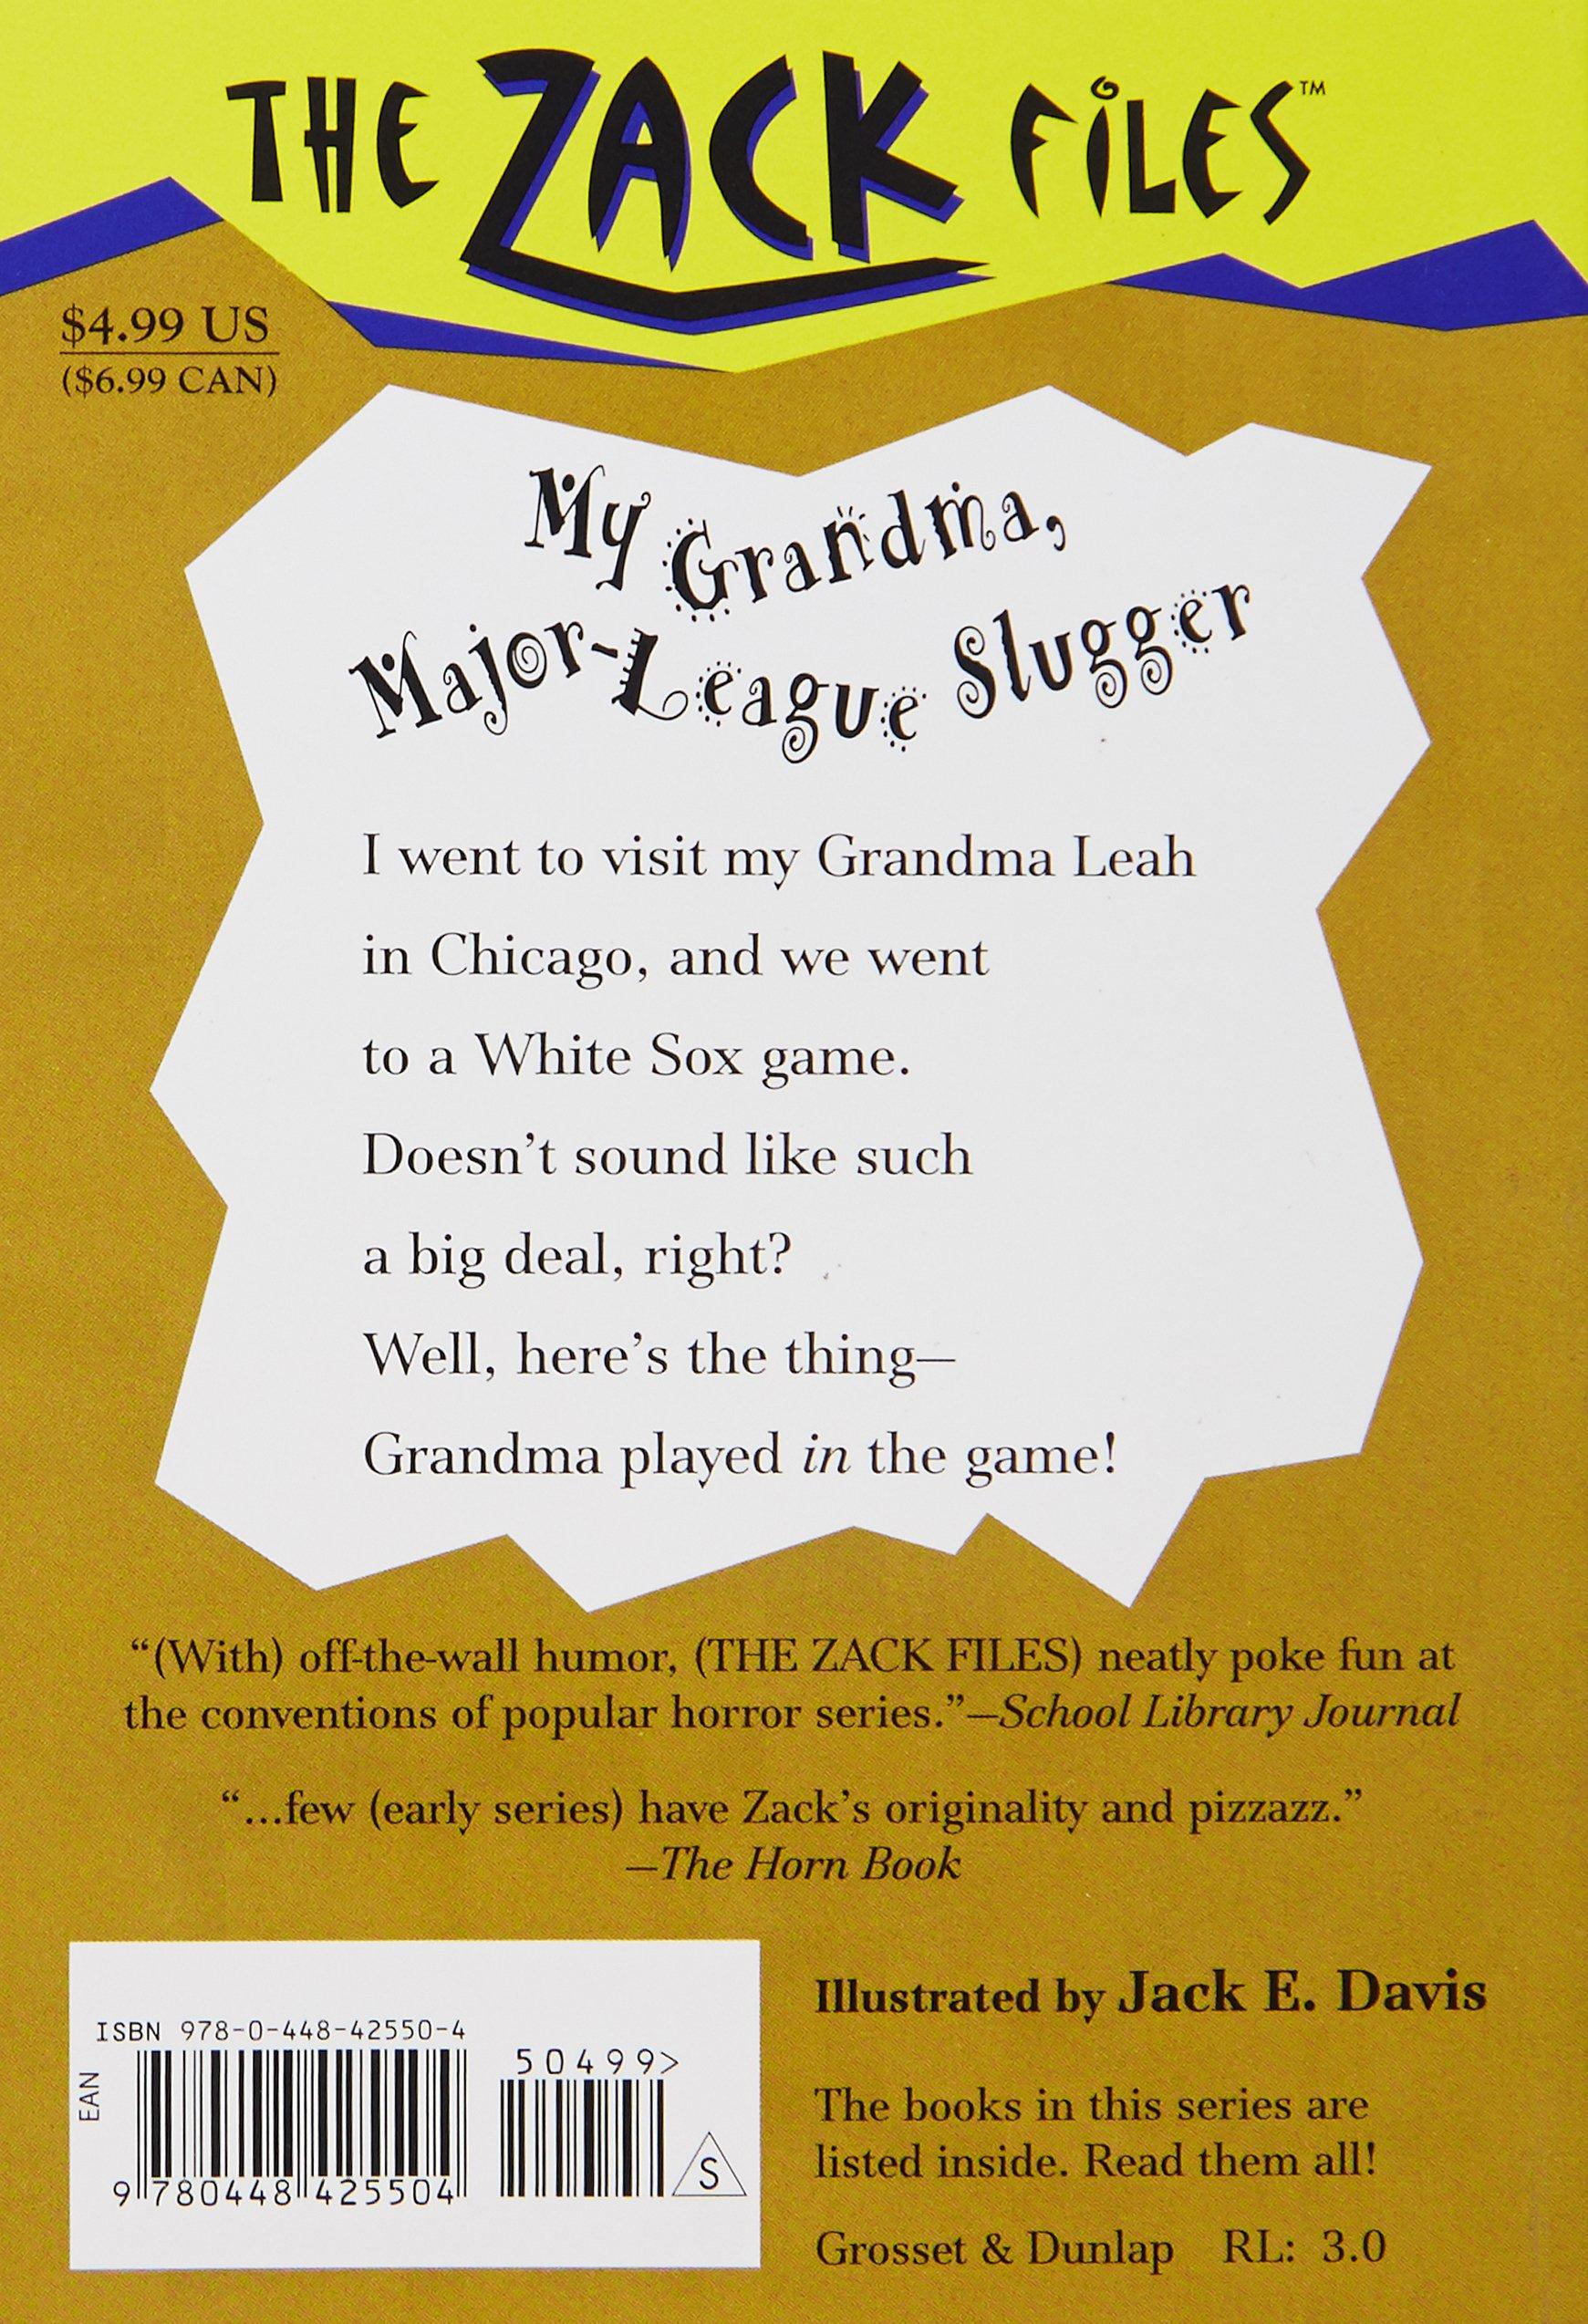 Amazon.com: Zack Files 24: My Grandma, Major League Slugger (The ...